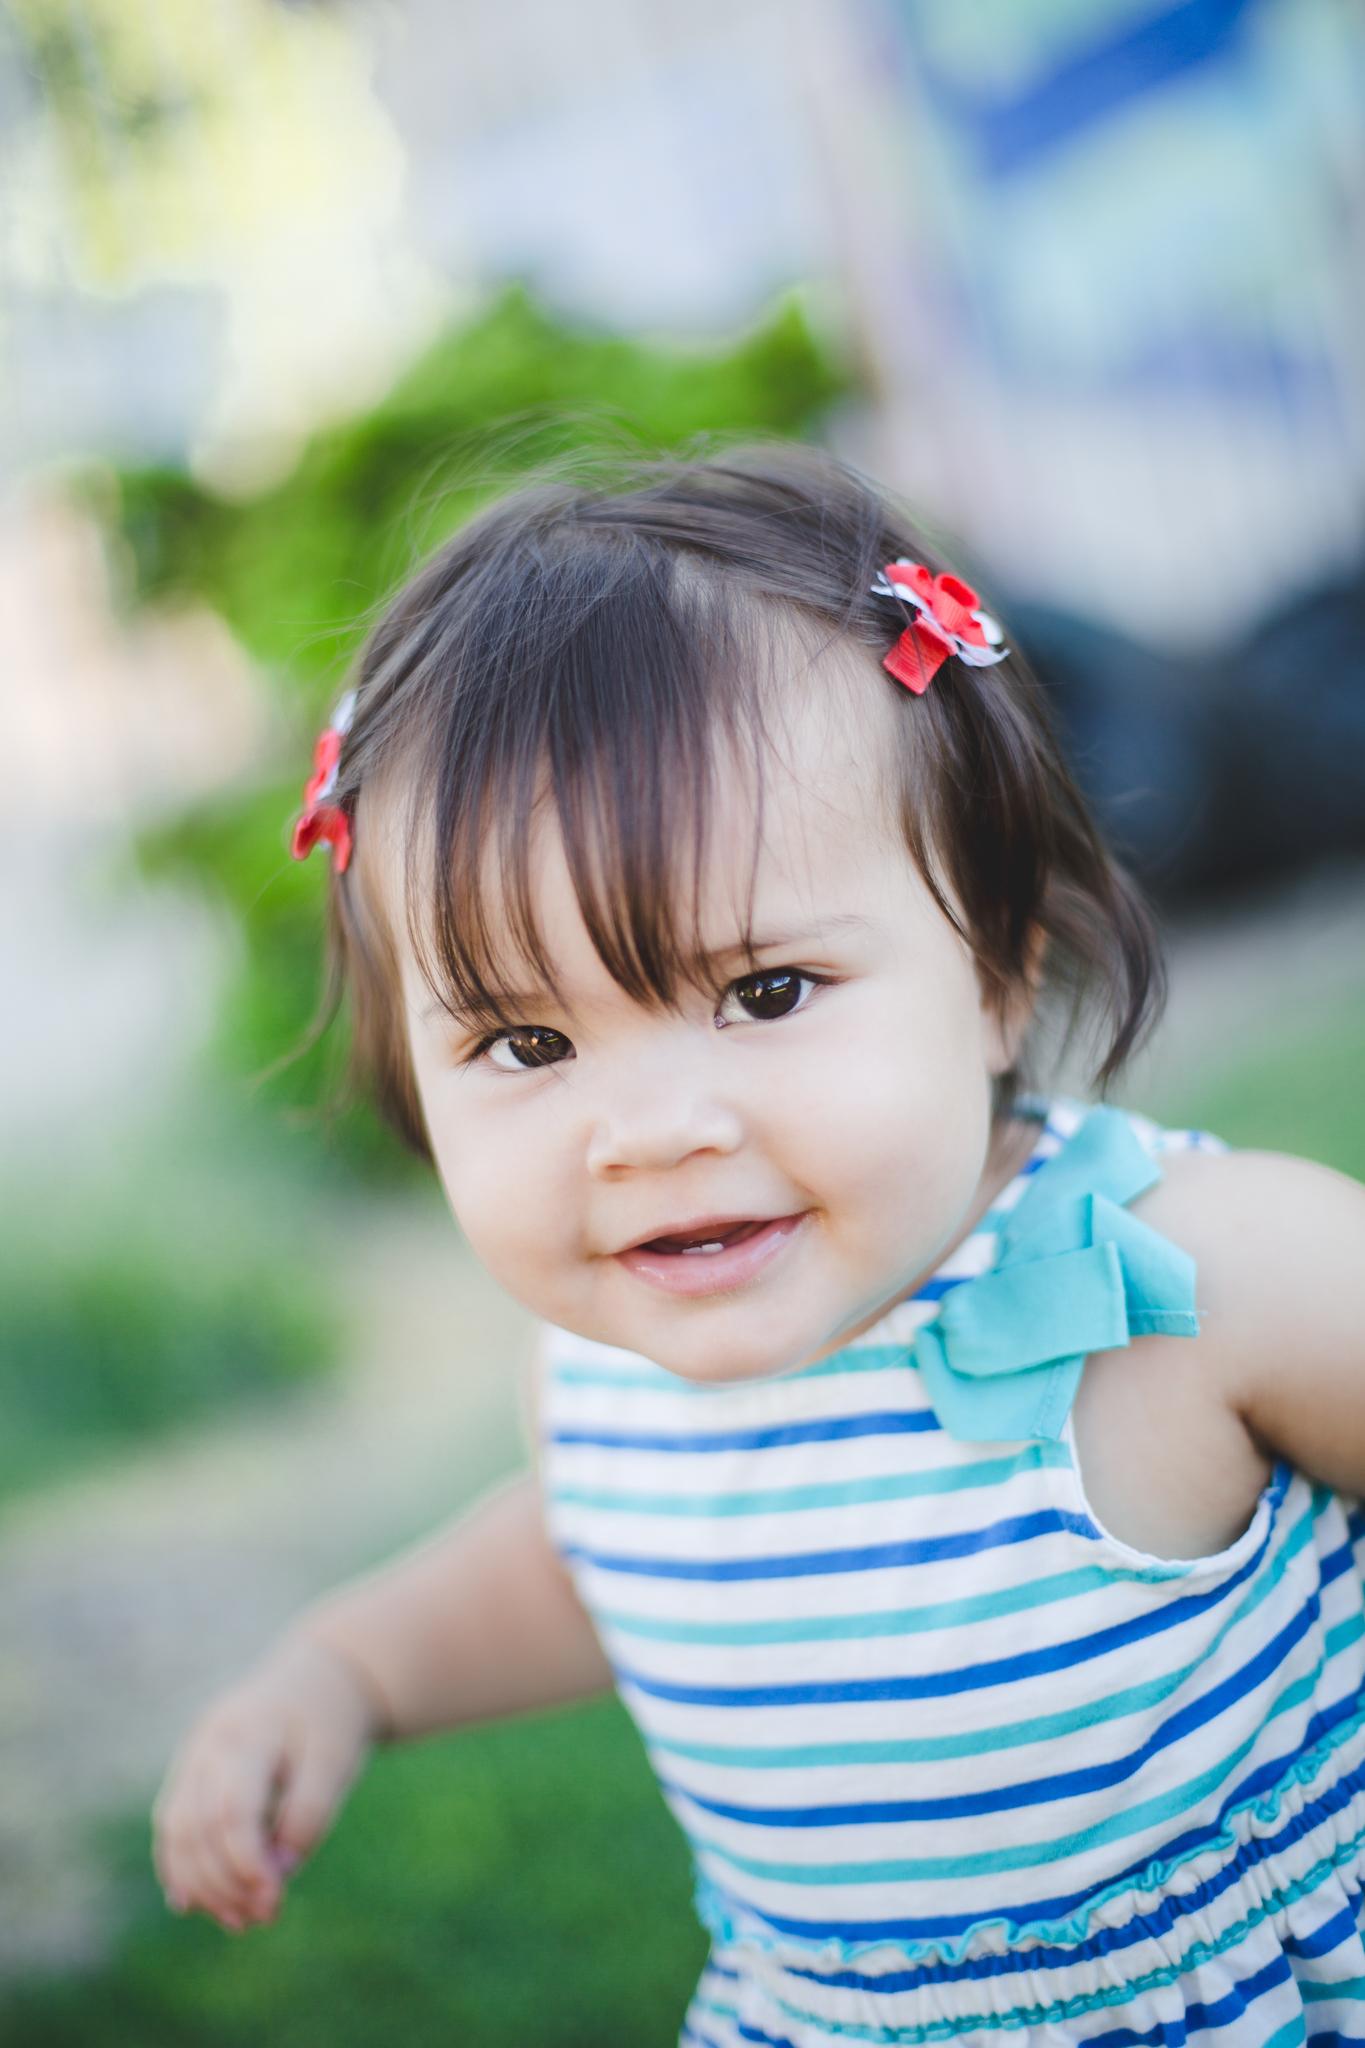 glendale-photographer-baby-mae-birthday-adorable-portrait